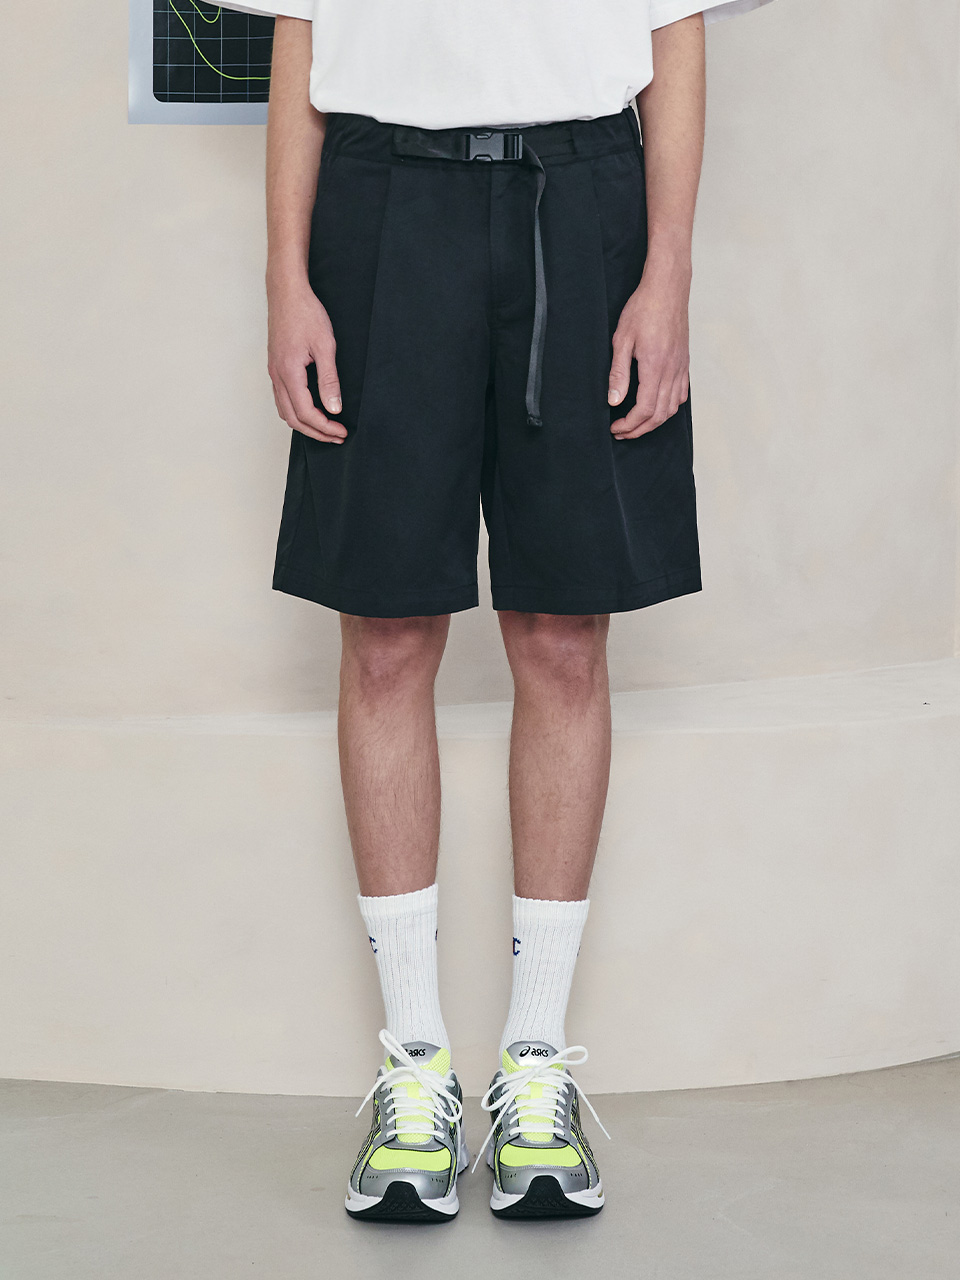 (PT-21141) R:LOL SHORT PANTS BLACK